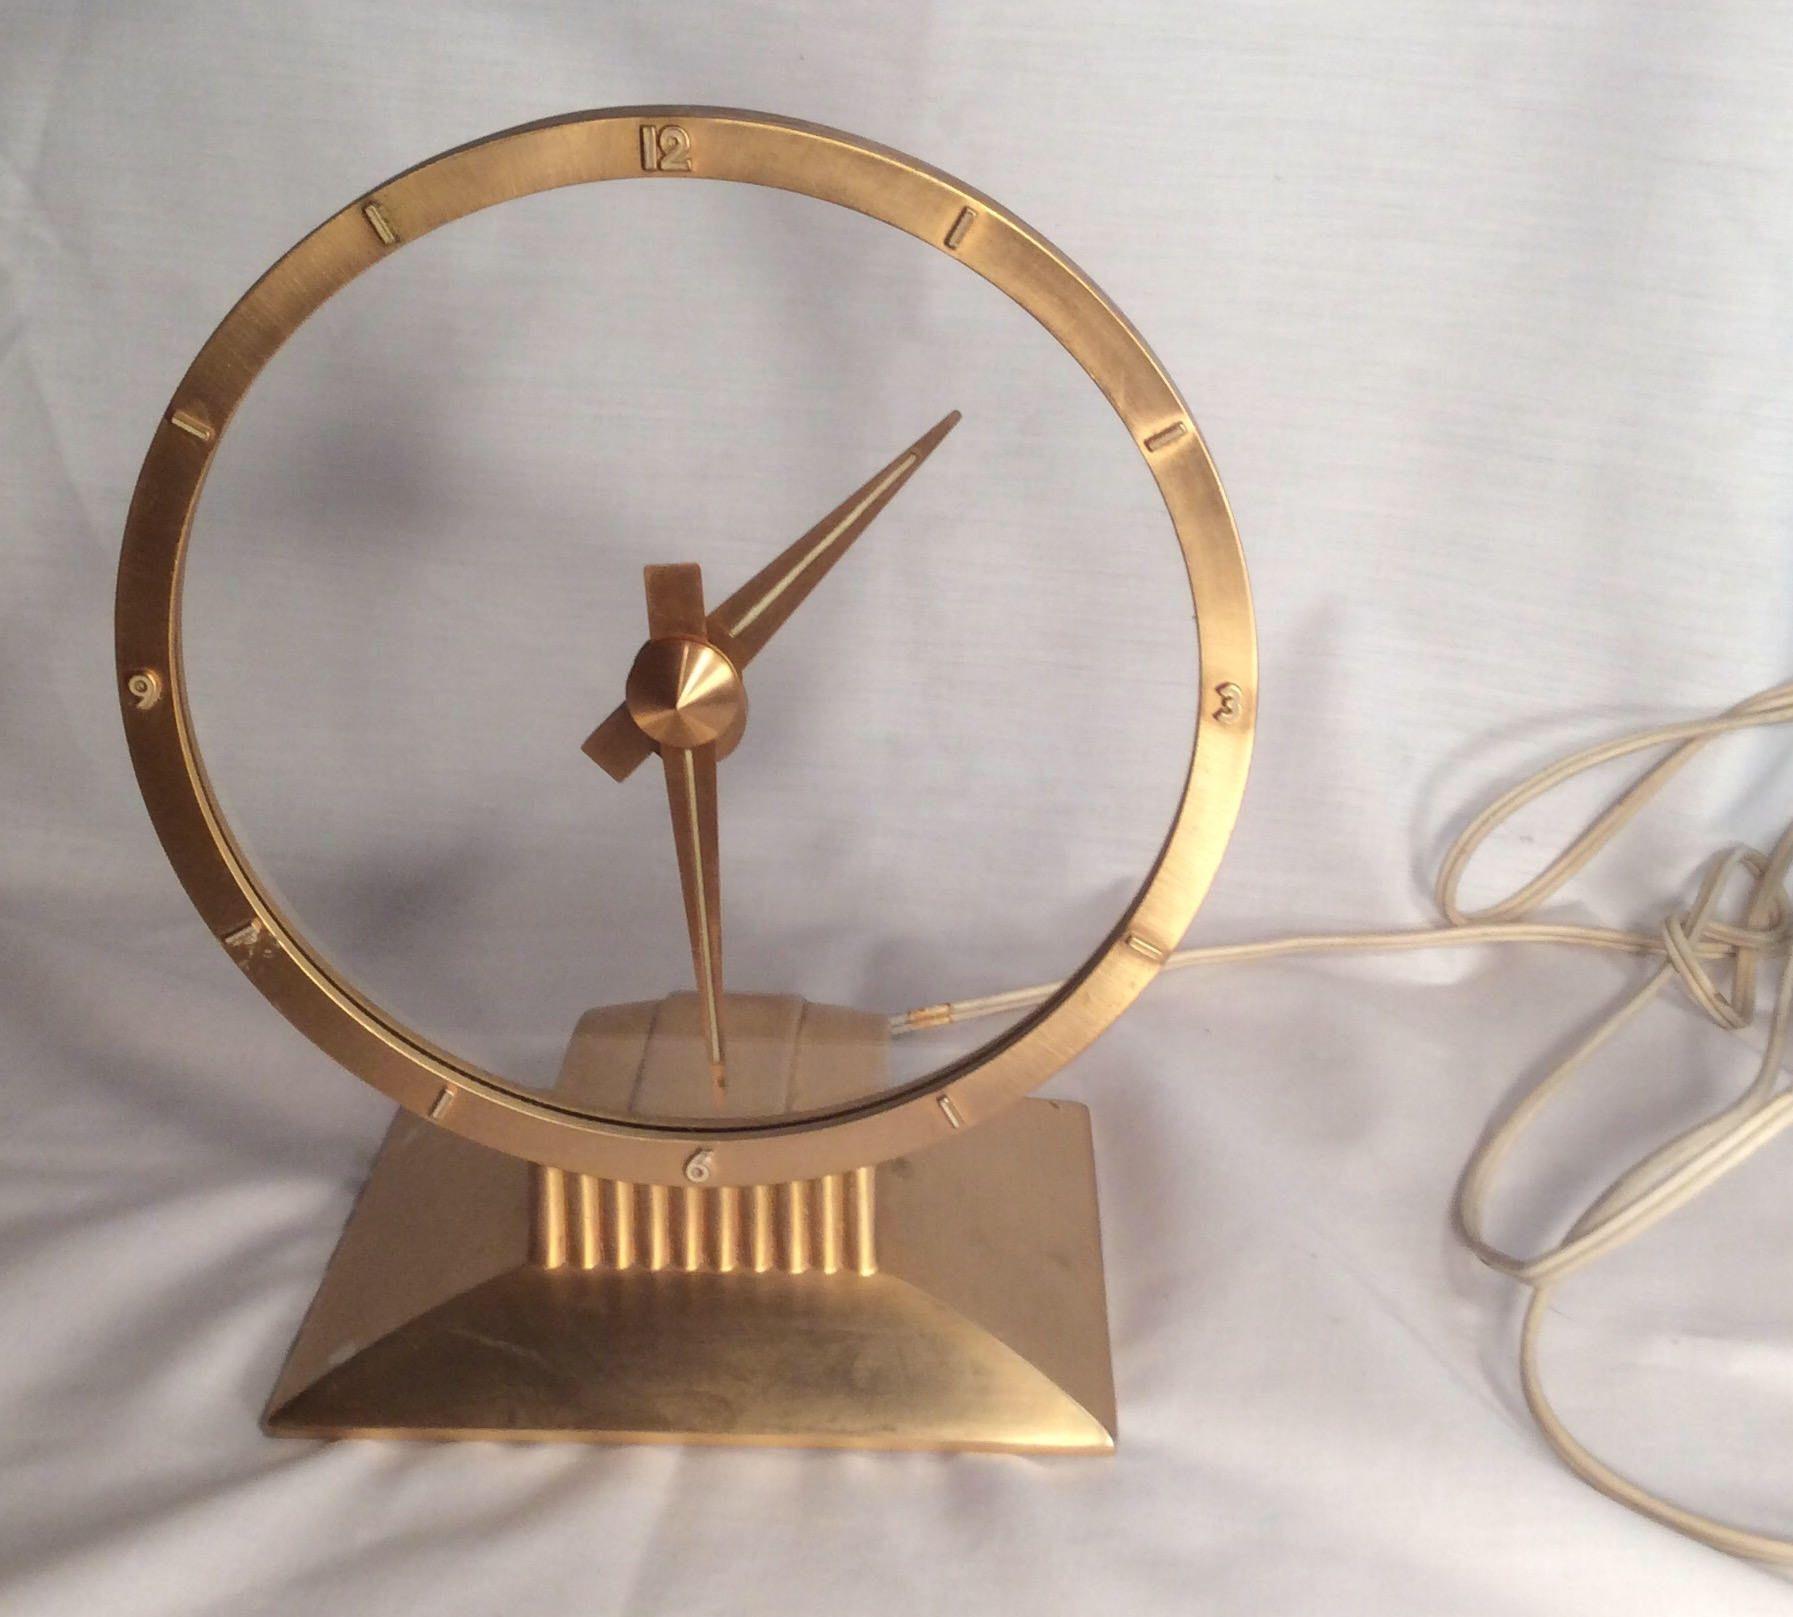 Jefferson golden hour electric clock vintage mid century